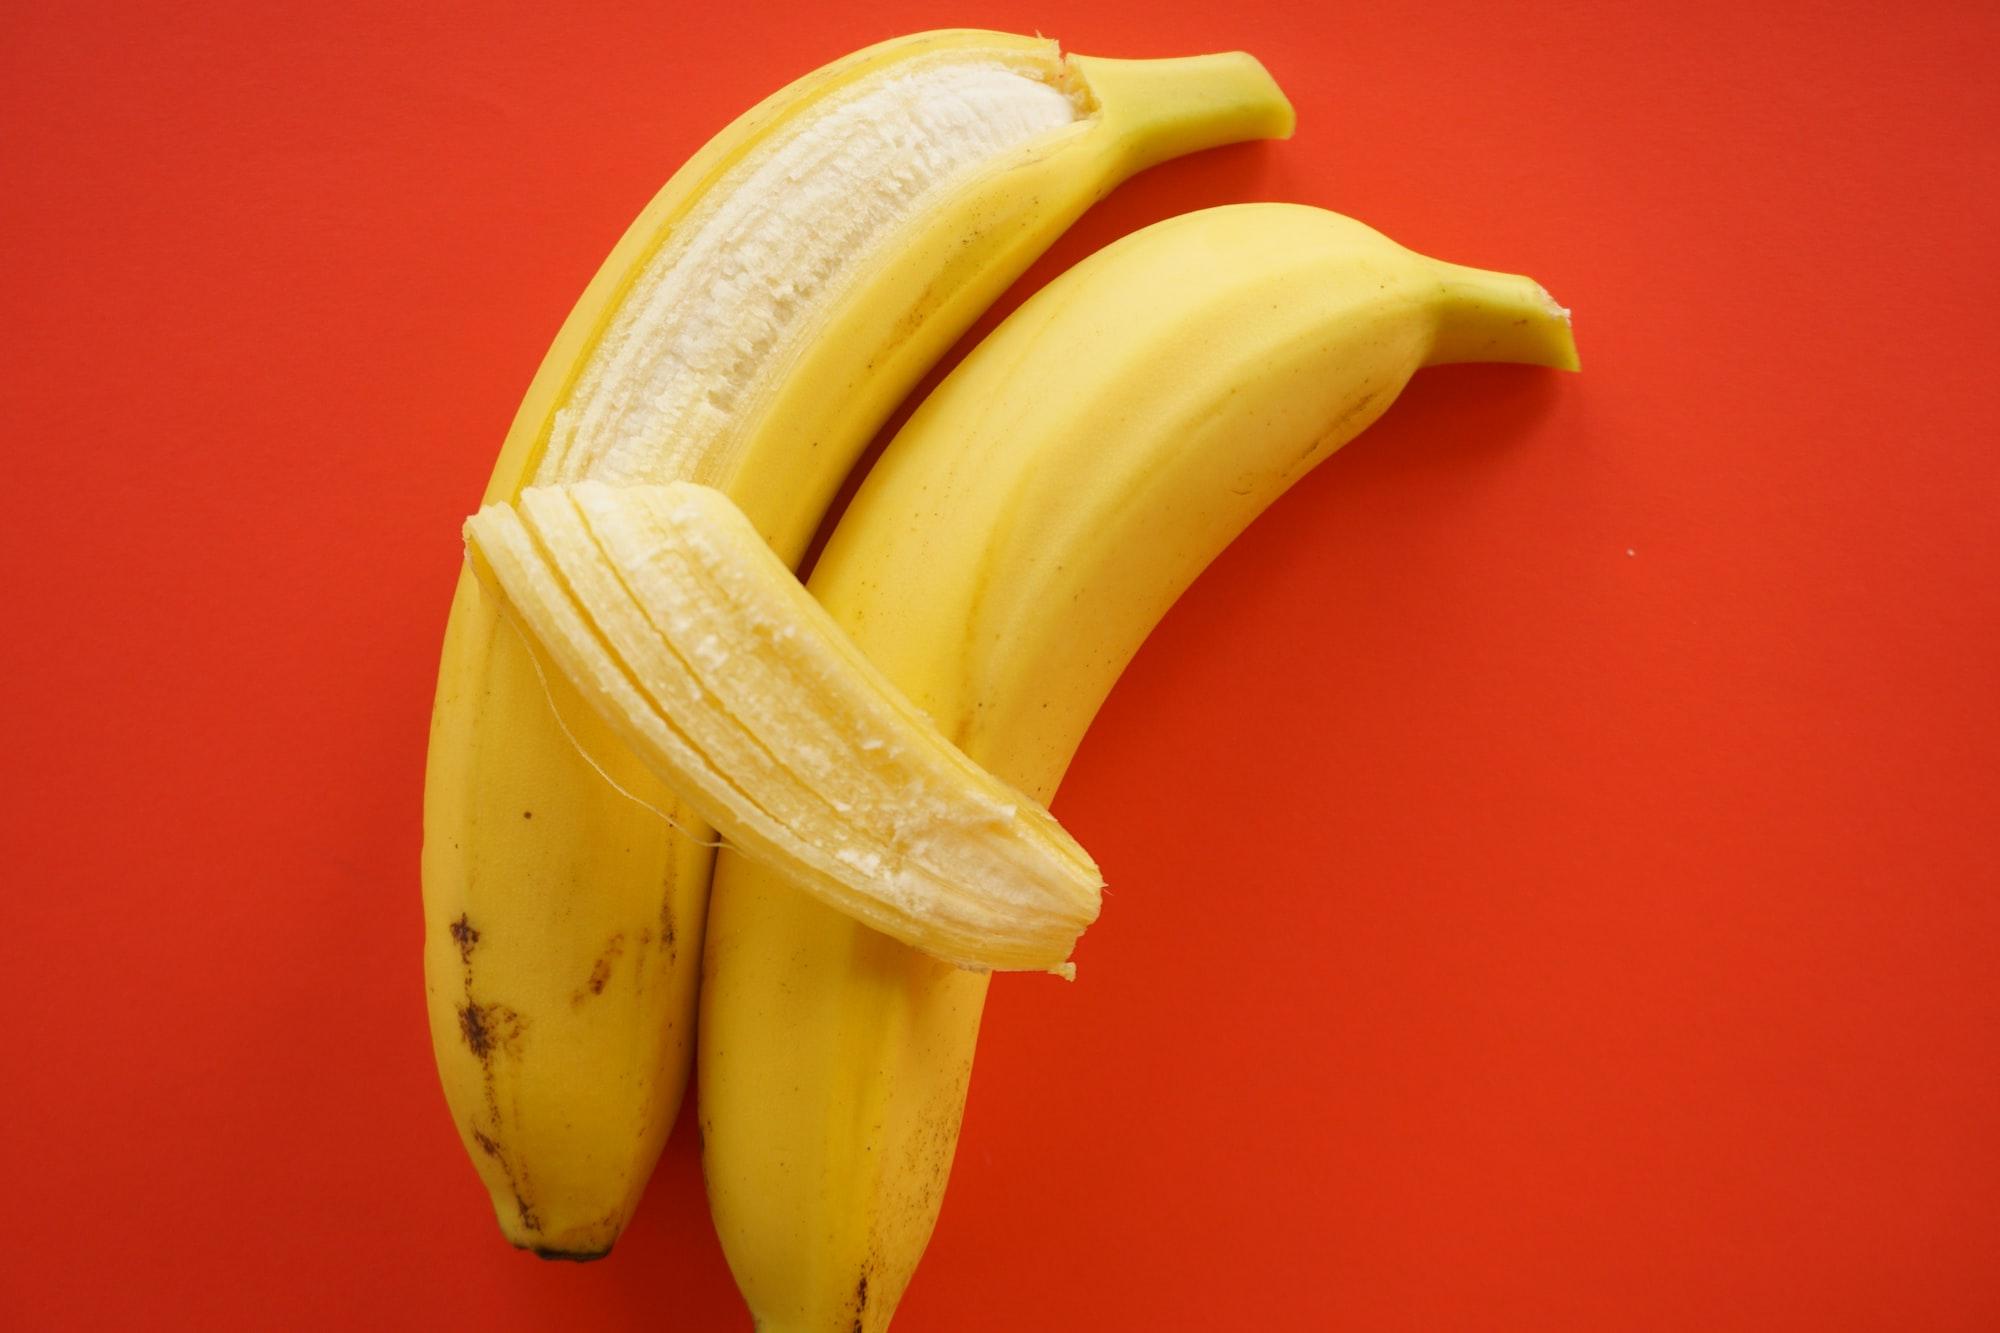 bananas cuddling